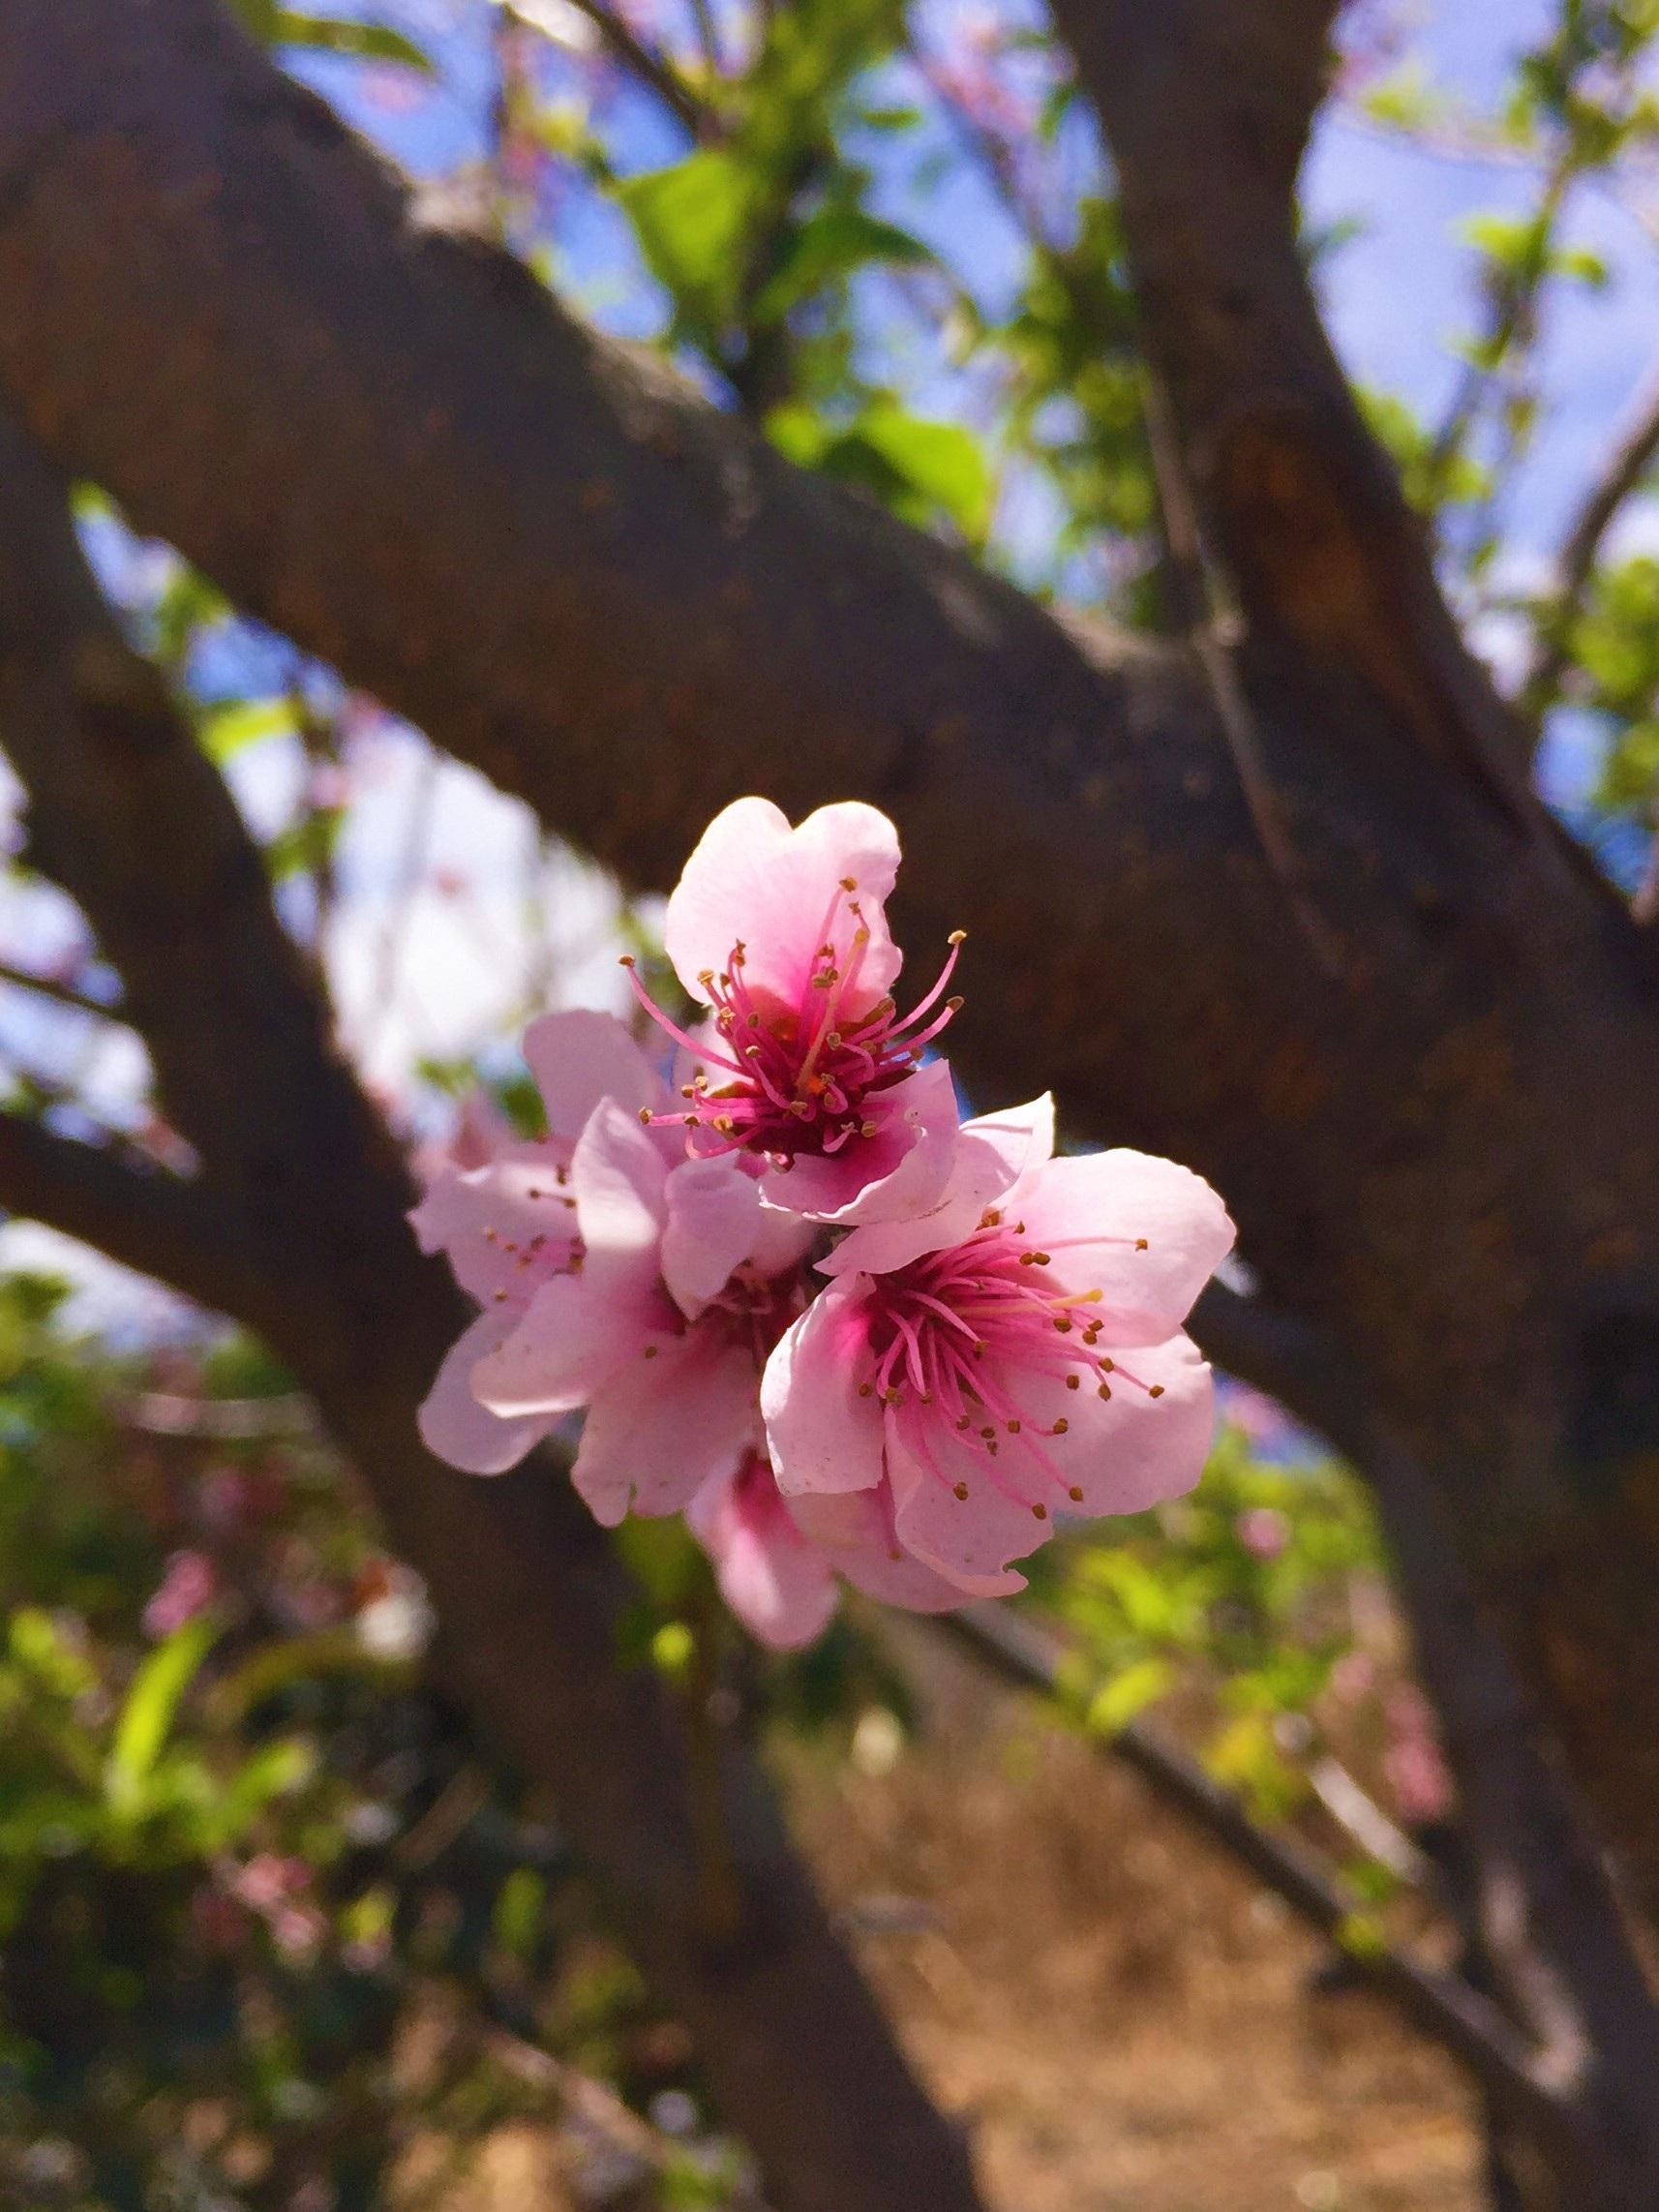 menghasilkan botani taman berwarna merah muda flora bunga liar bunga sakura bunga bunga kelopak belukar rosa memangkas bunga merah muda